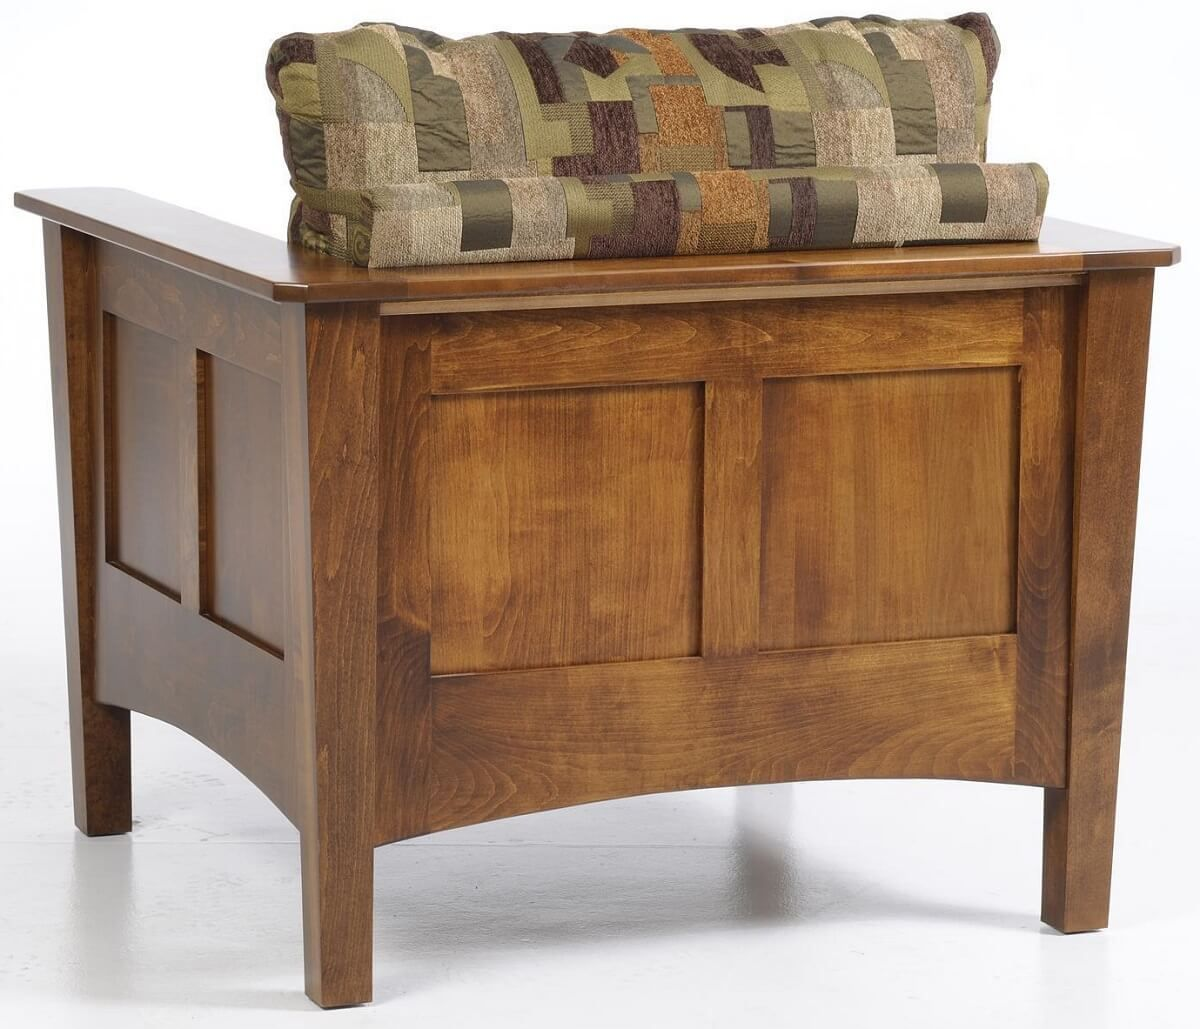 Rhode Island Chair back